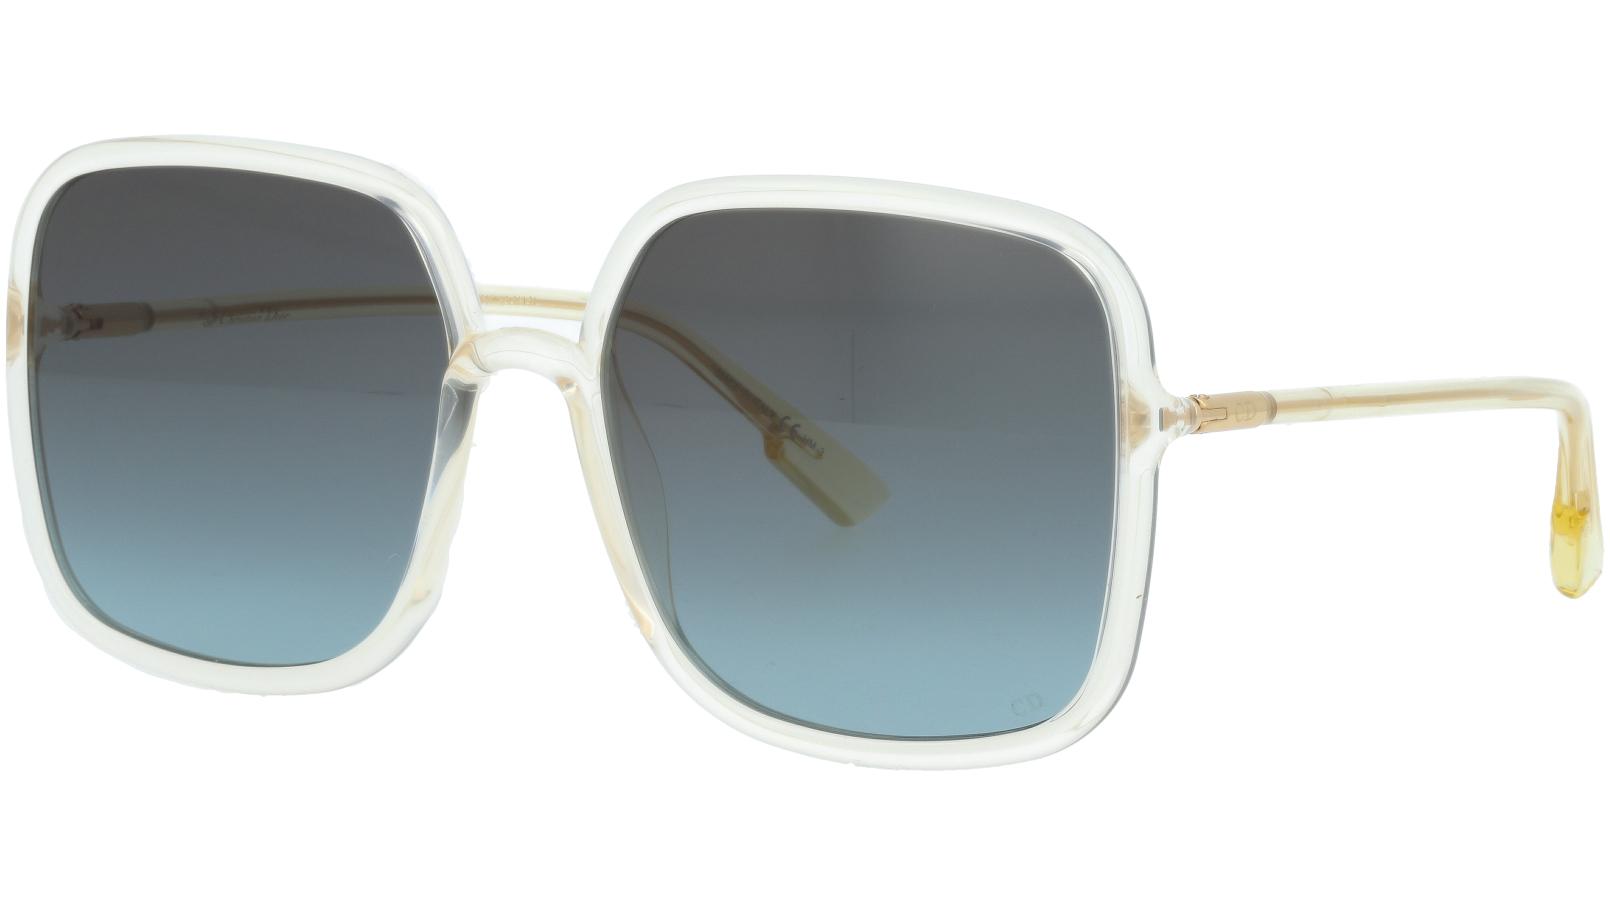 DIOR SOSTELLAIRE1 KB790 59 GREY Sunglasses